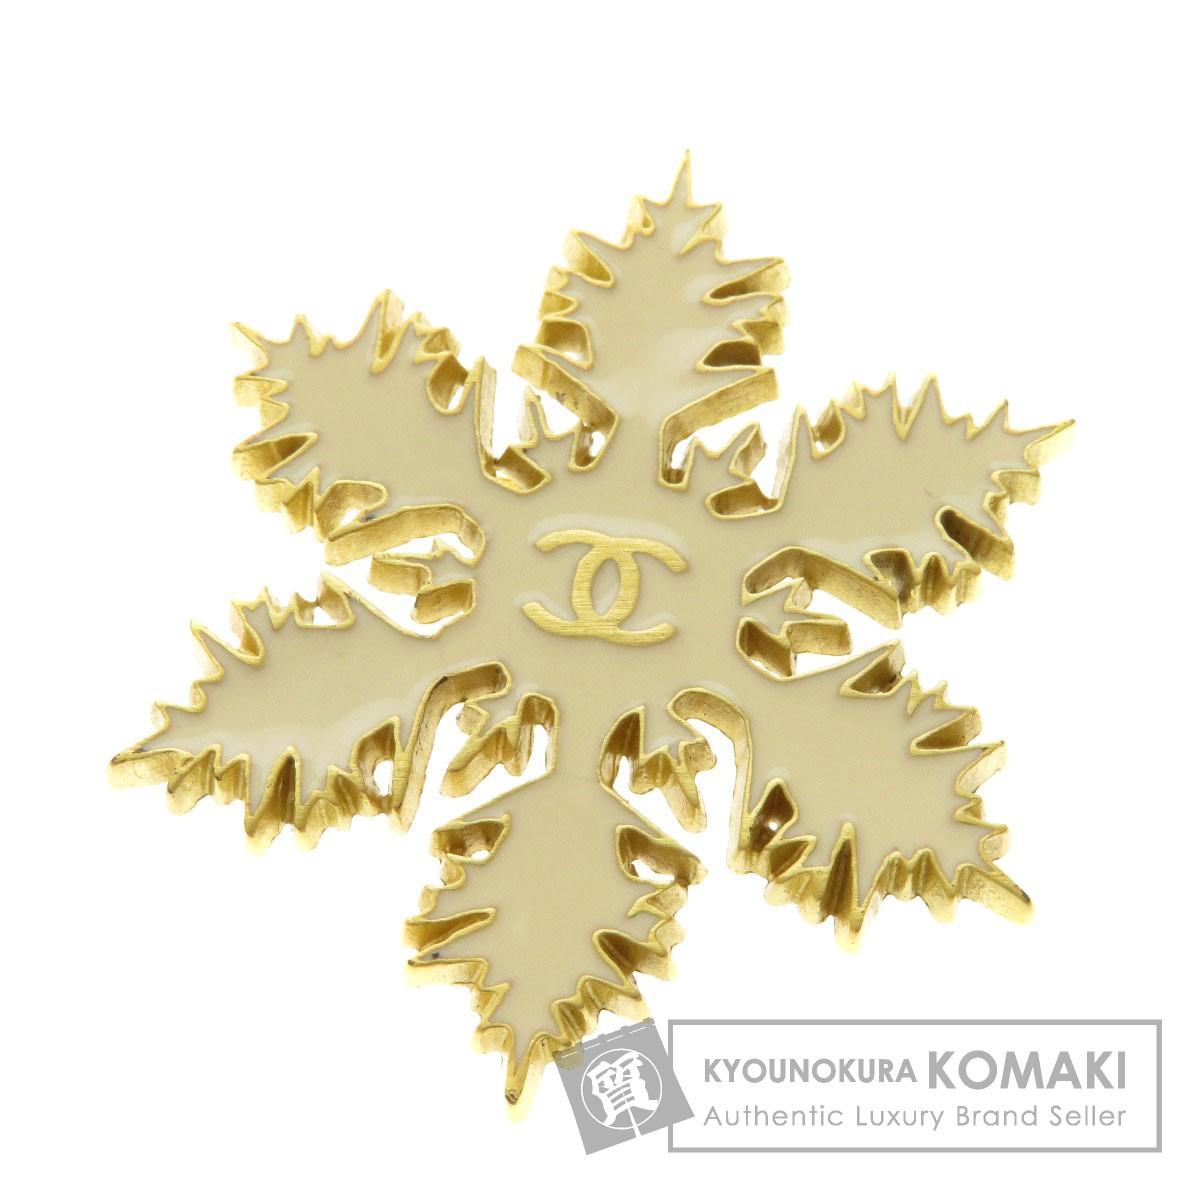 CHANEL ココマーク 雪の結晶 ブローチ 金属製 レディース 【中古】【シャネル】